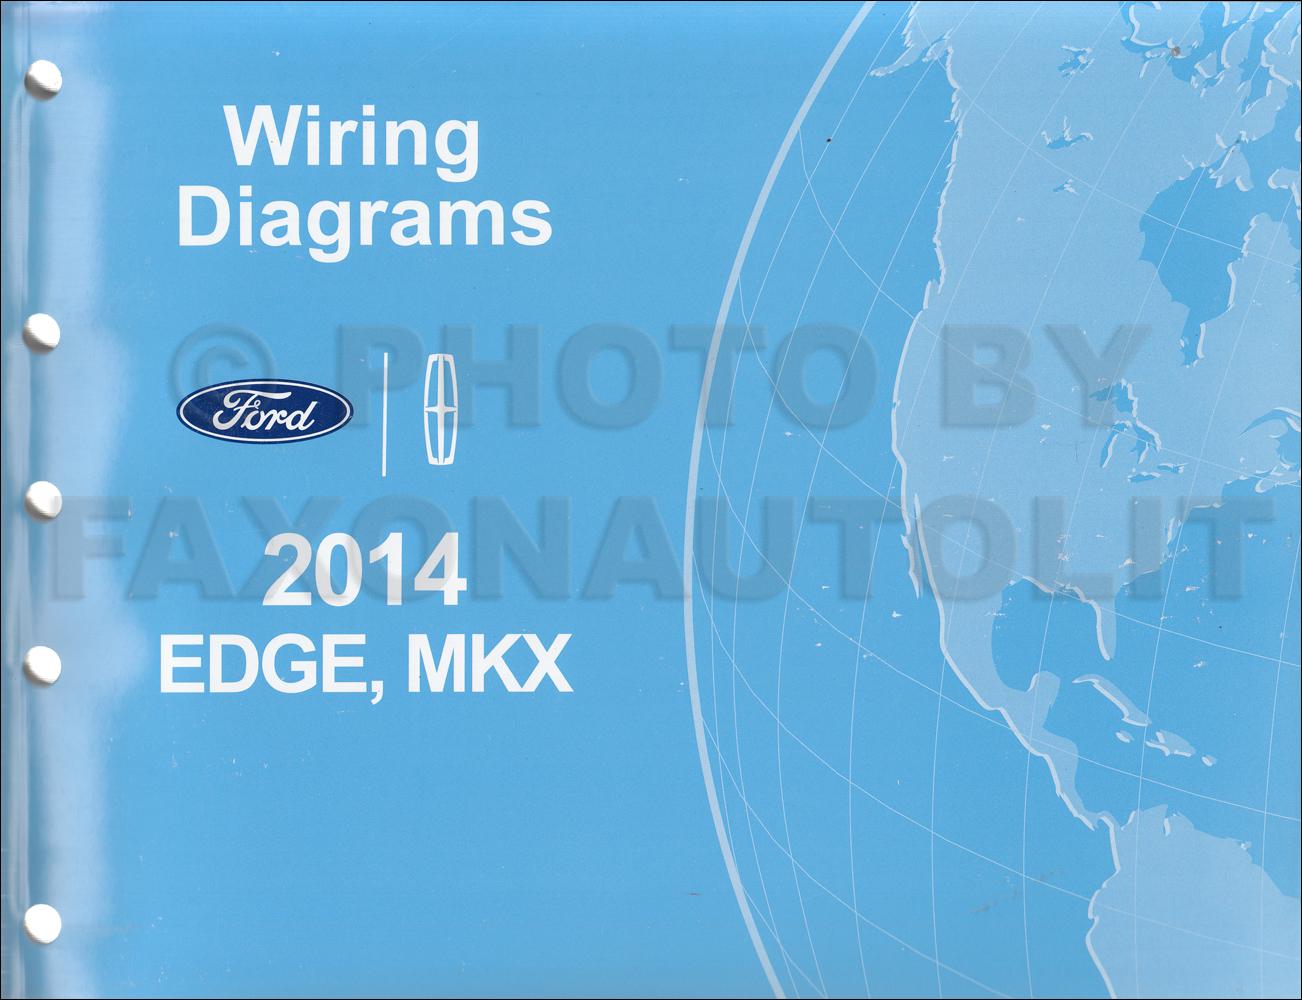 1947 Lincoln Wiring Diagram 2014 Ford Edge Lincoln Mkx Wiring Diagram Manual Original